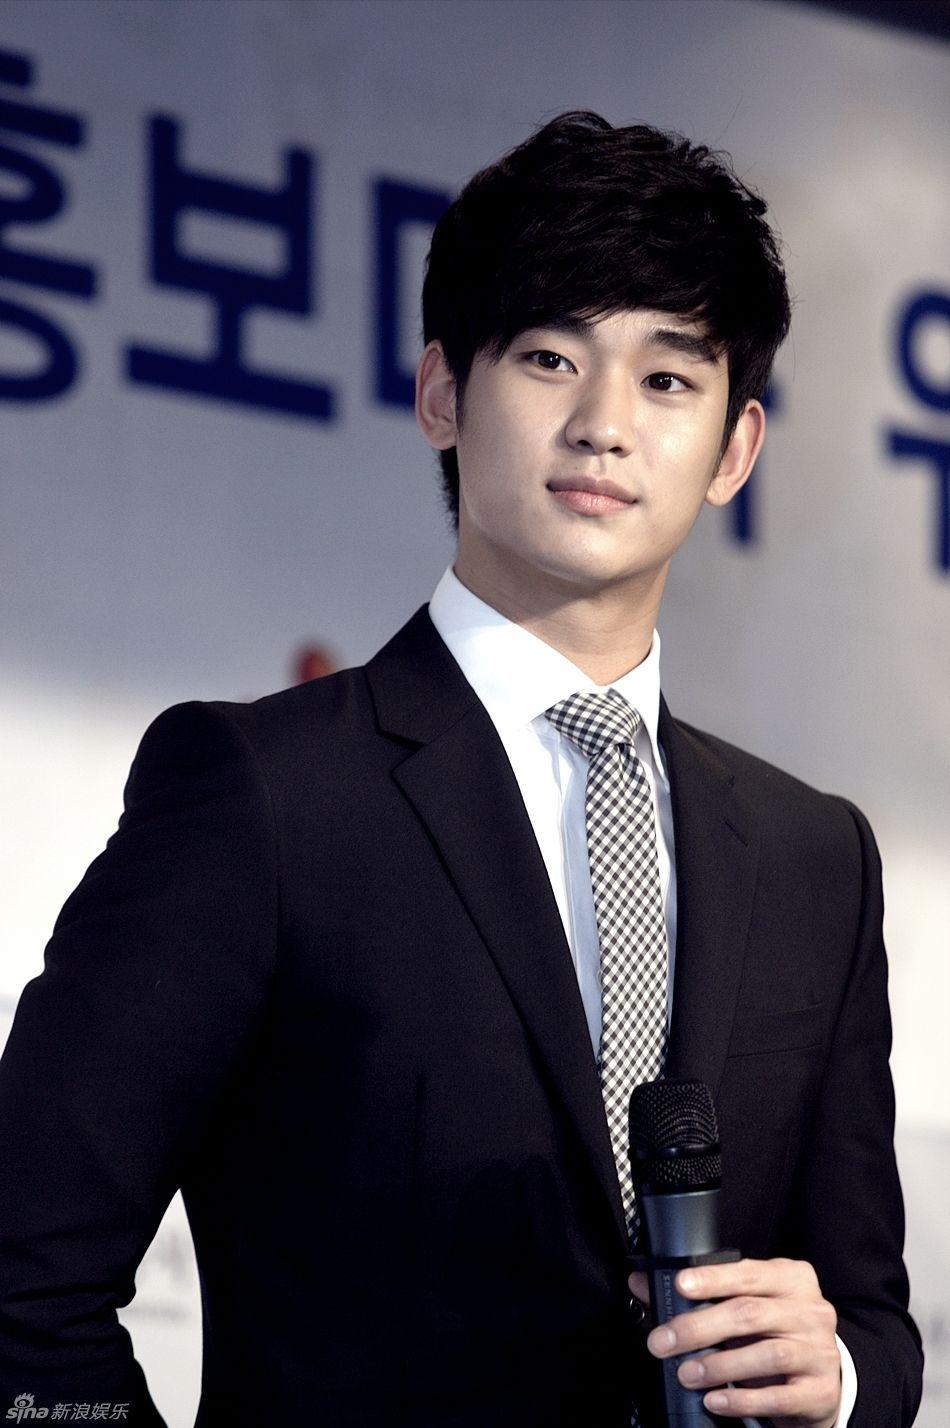 Kim Soo Hyun Elected Tourism Ambassador by the Korea Tourism Organization #7 #KimSooHyun #SooHyun #KTO